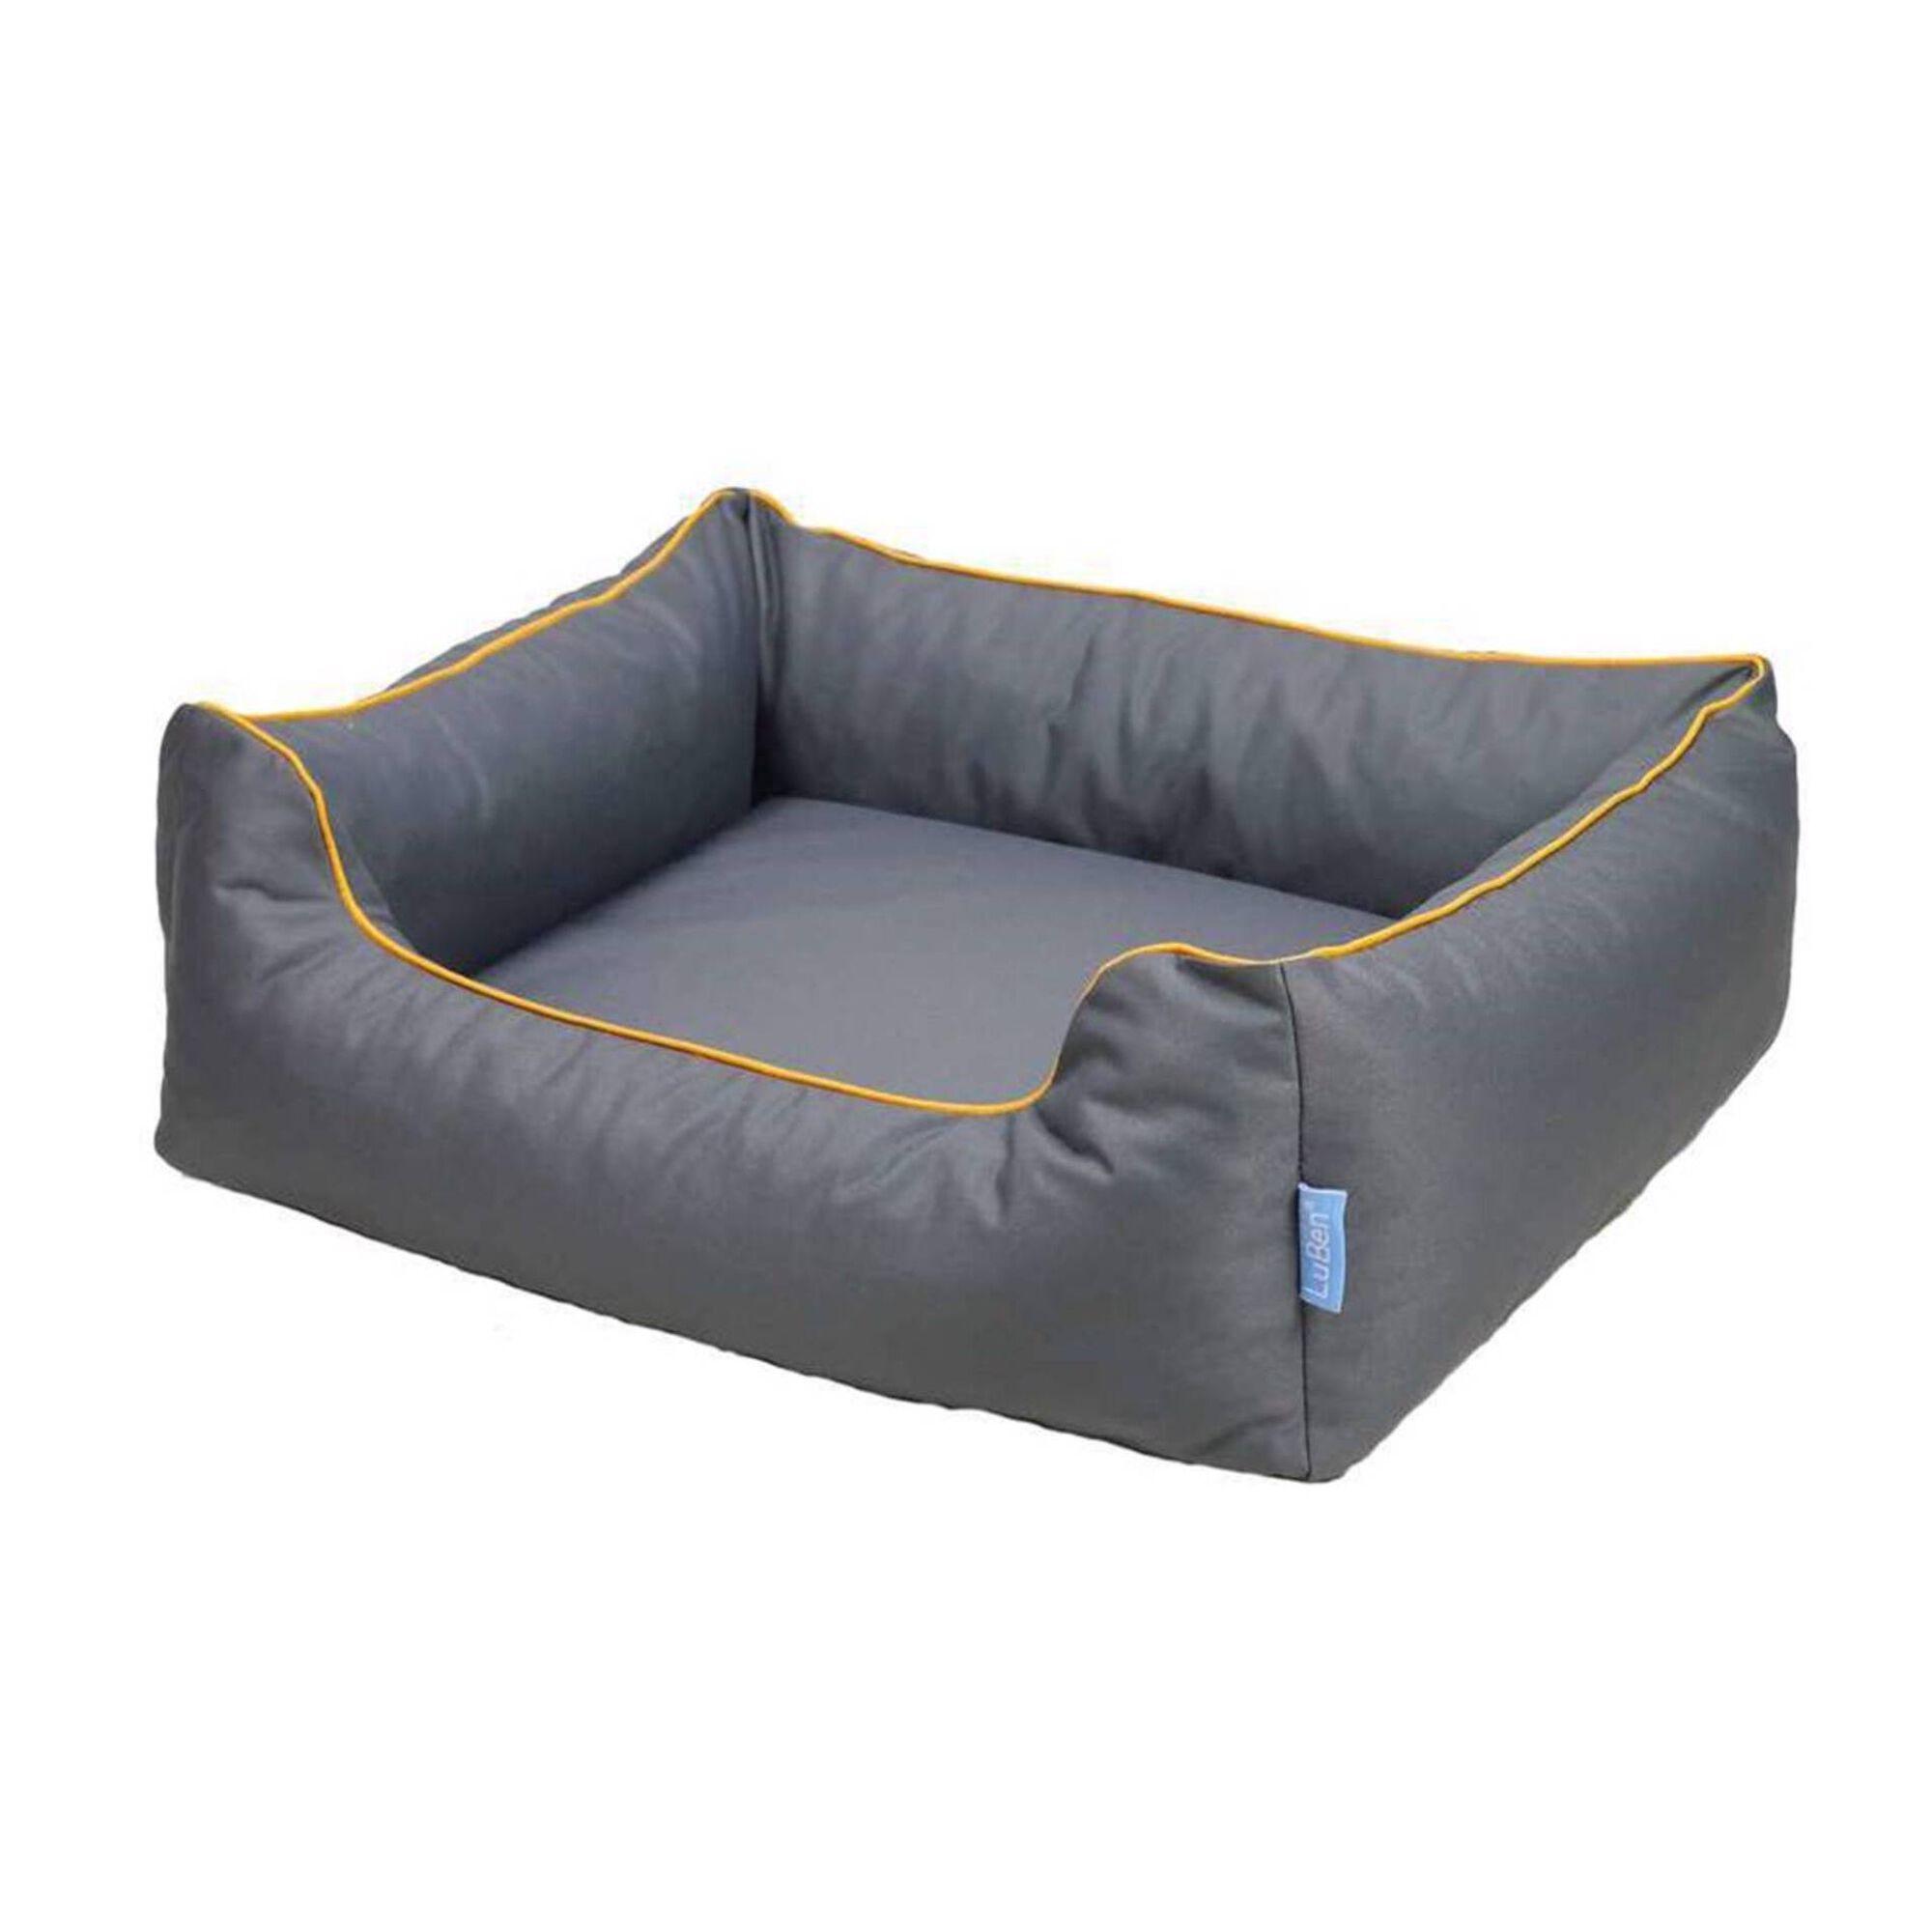 Cama Sofá para Cão Impermeável Xtreme Cinzento XS